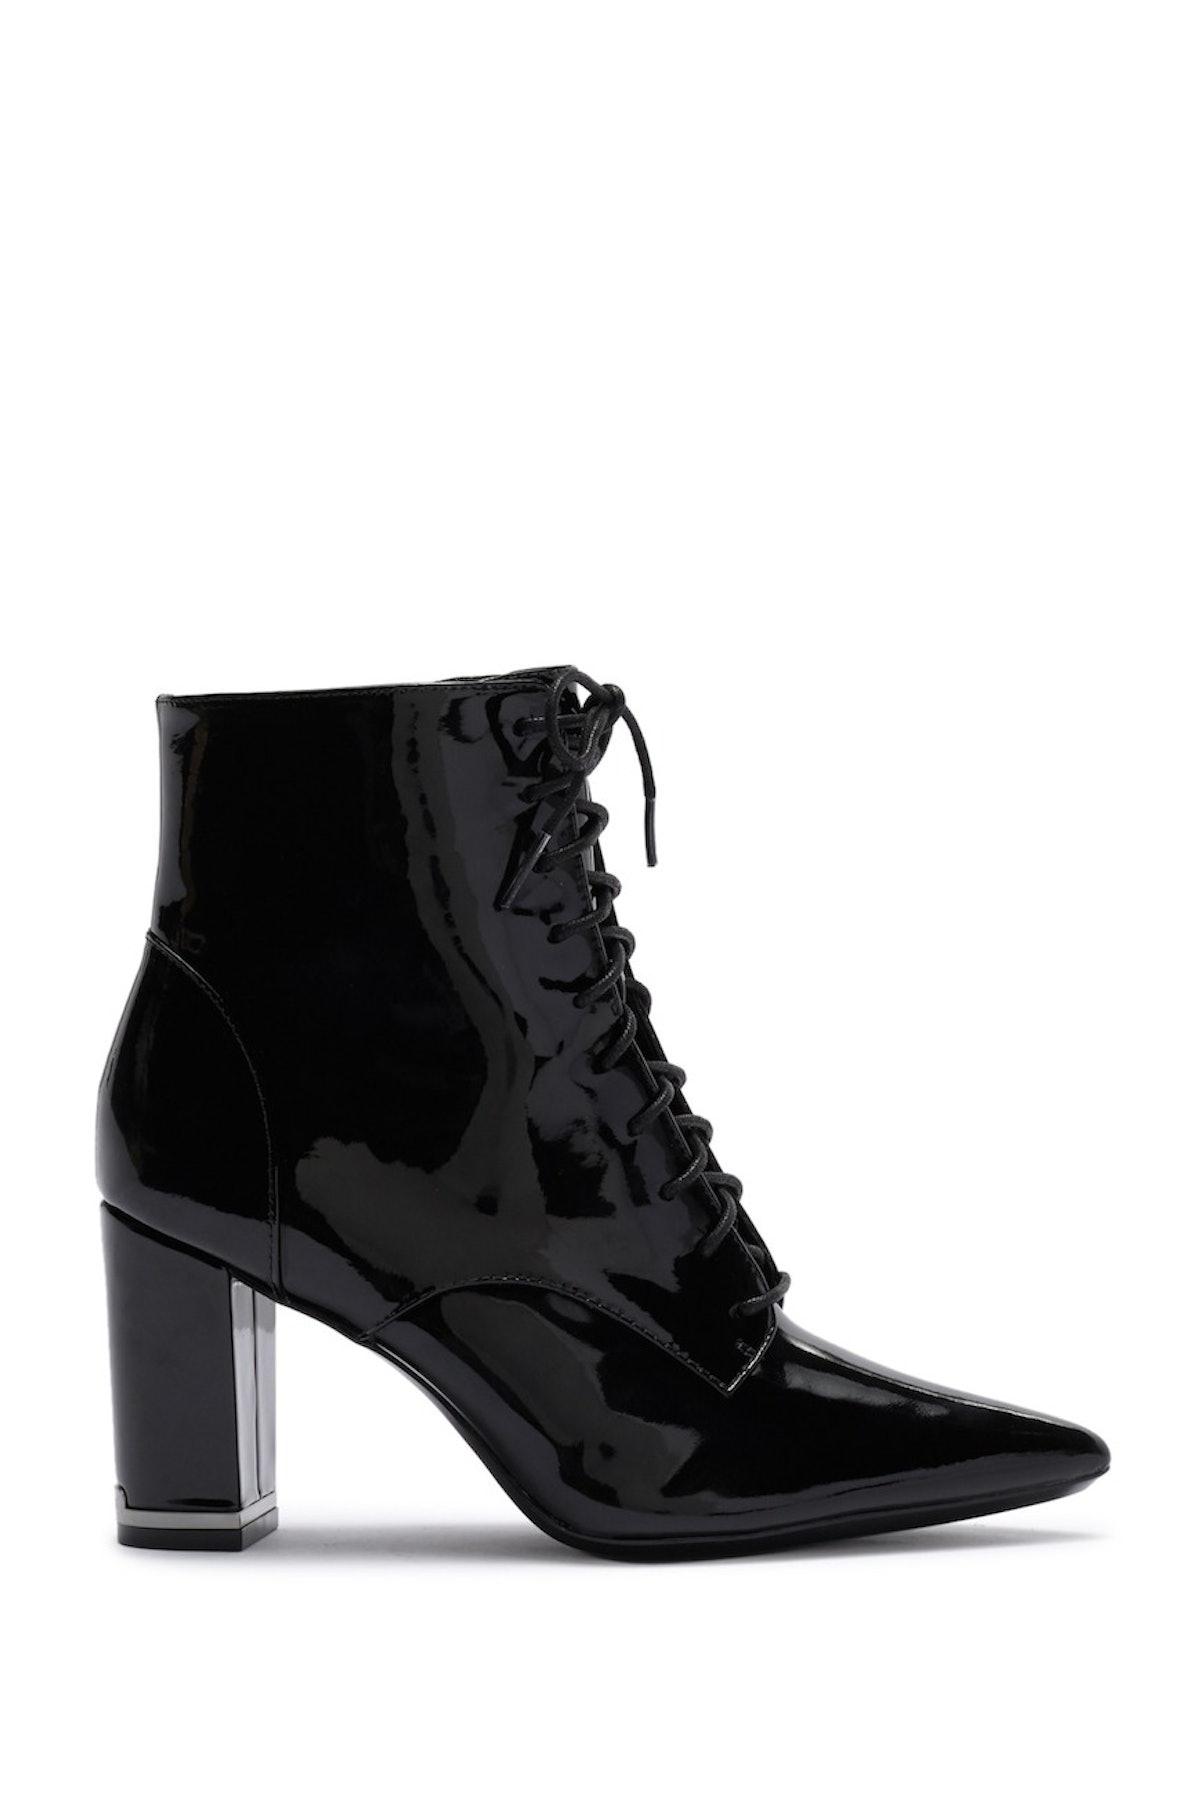 Calvin Klein Esma Patent Leather Lace Up Bootie